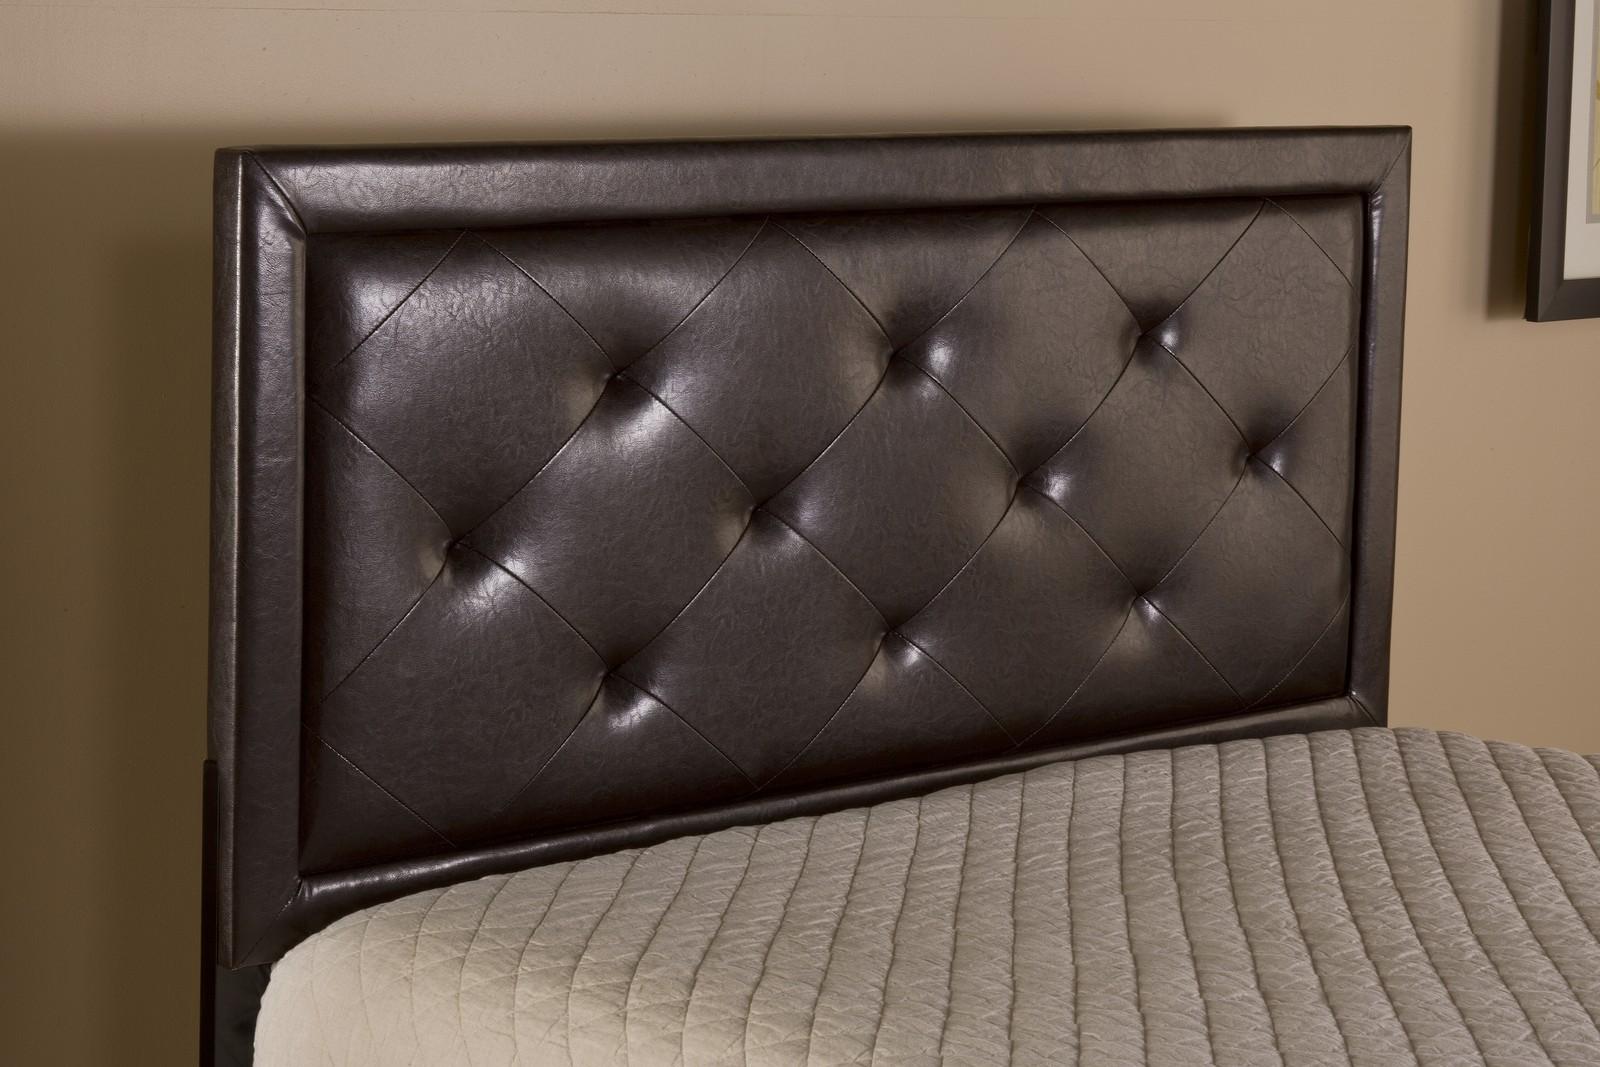 Hillsdale Becker Headboard - Brown Faux Leather